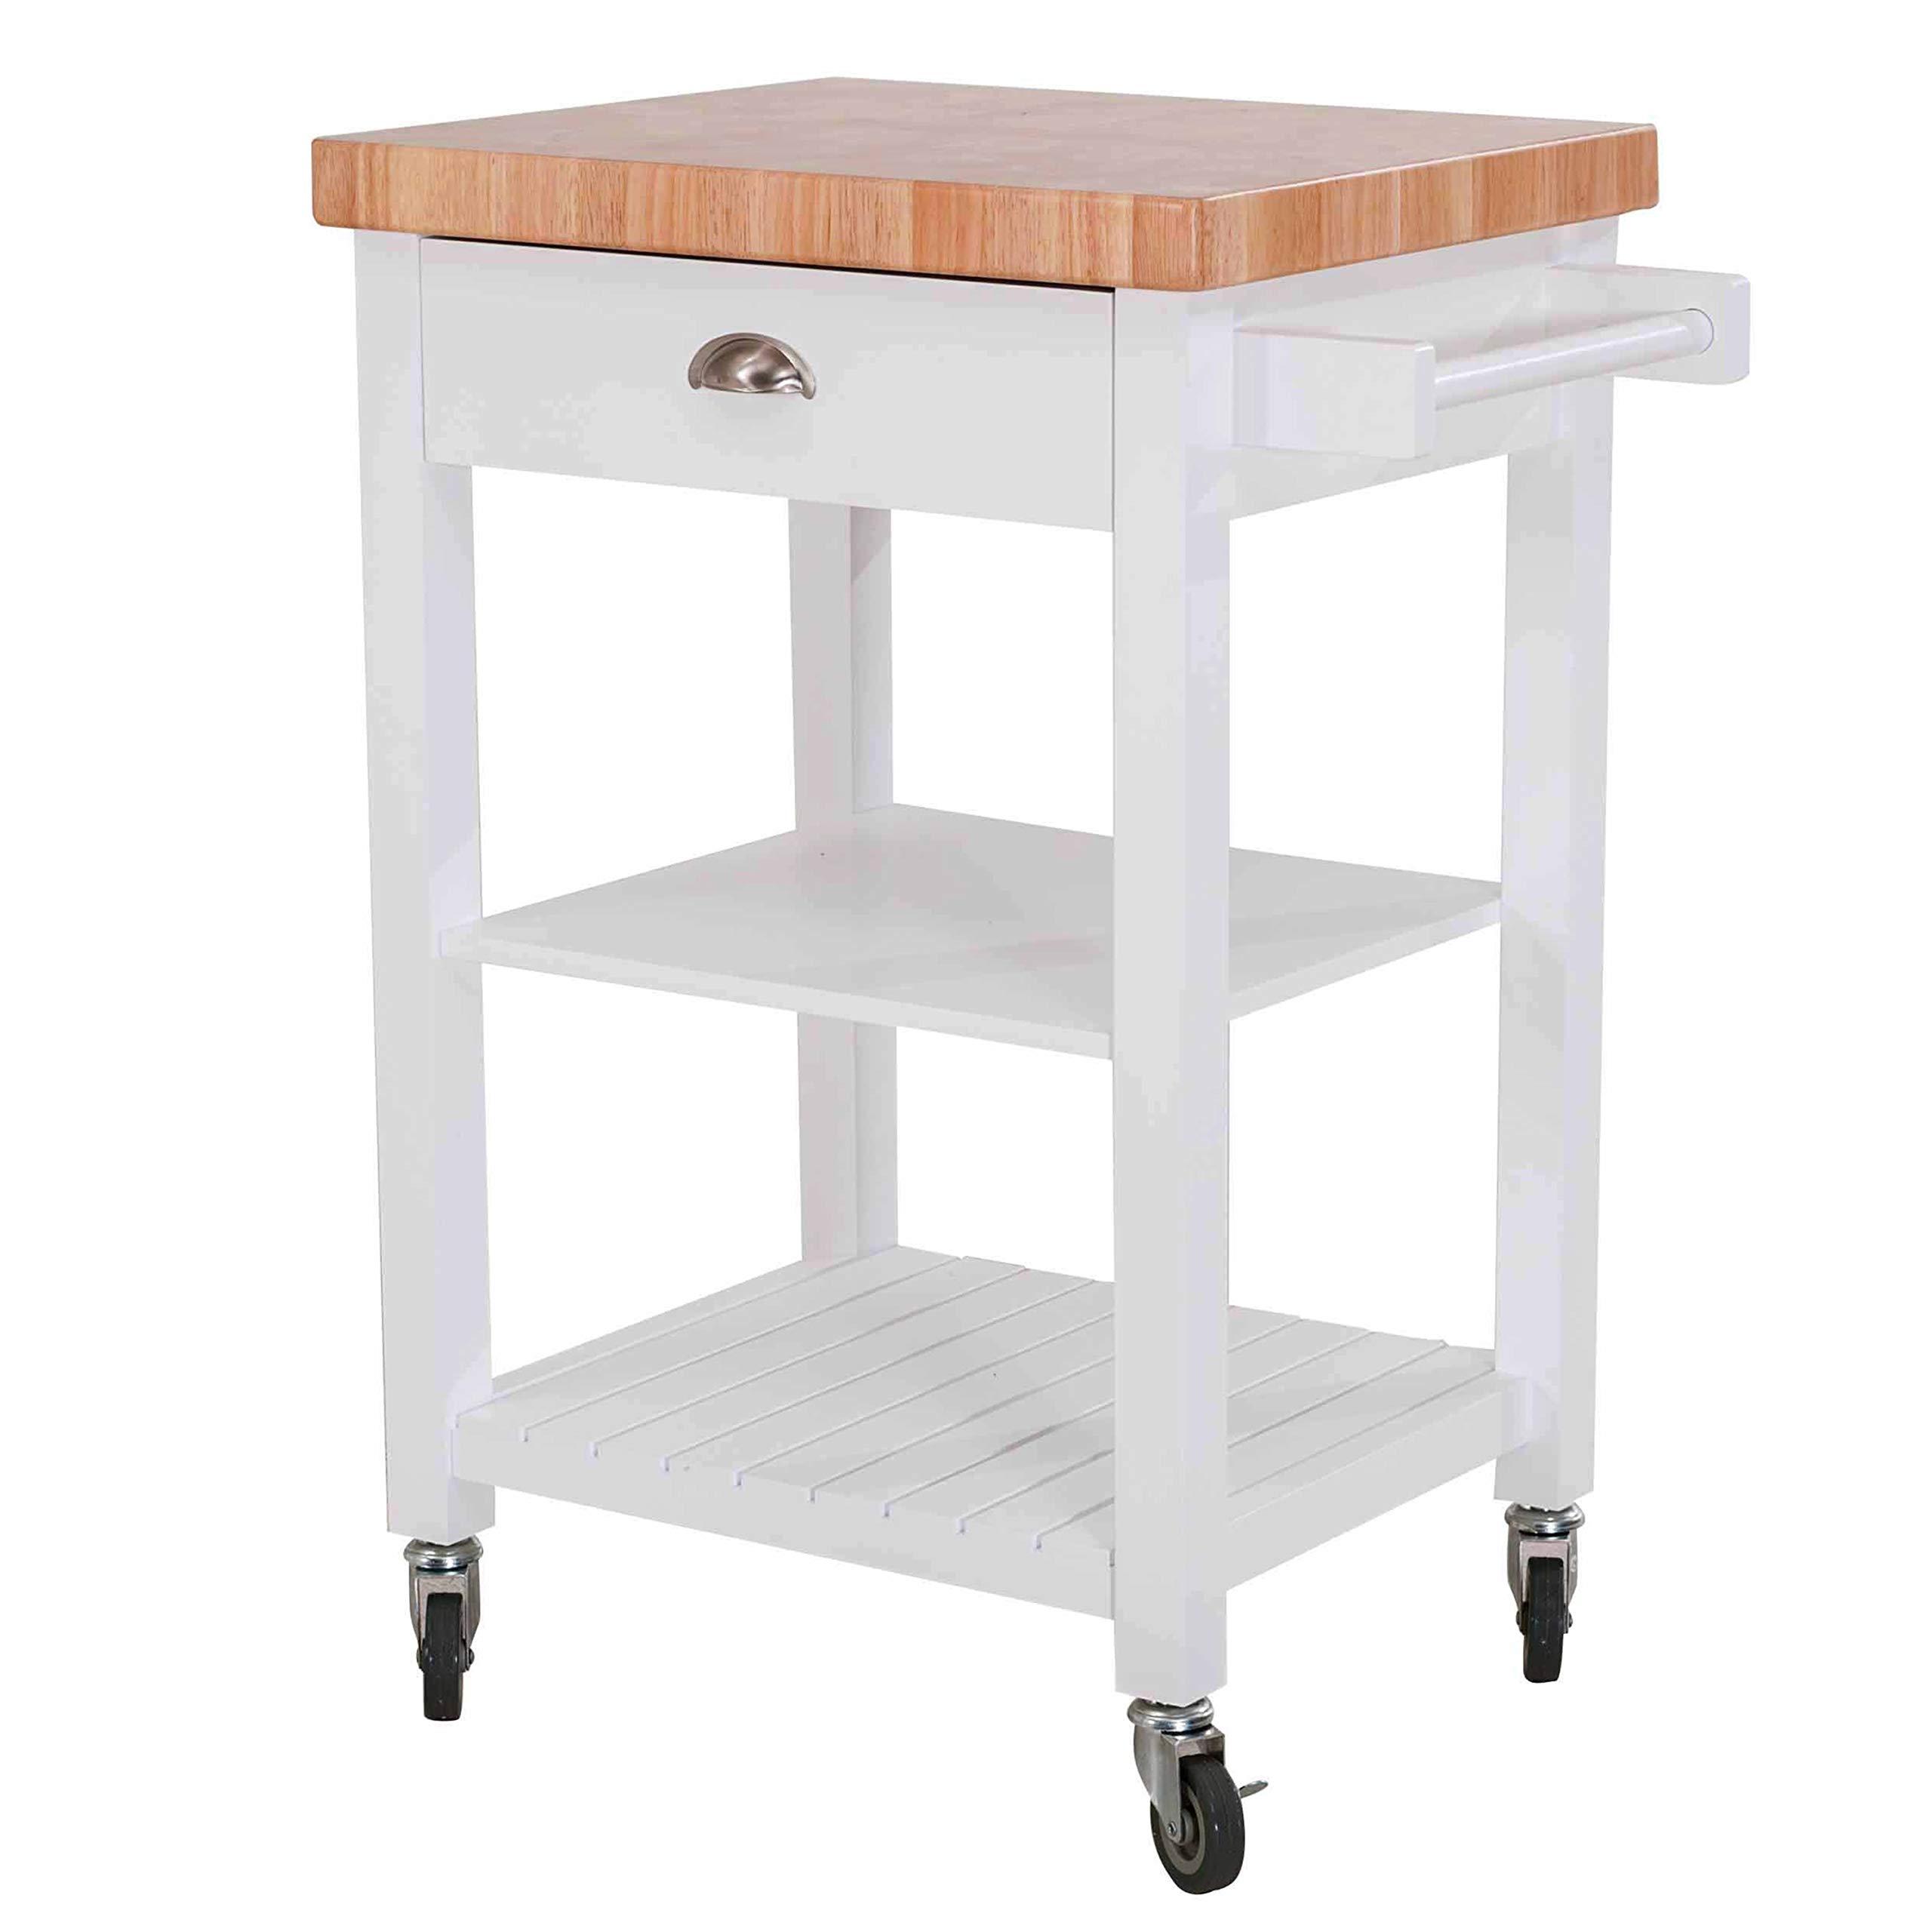 SJ Collection 120306009-W Bedford Kitchen Cart, White